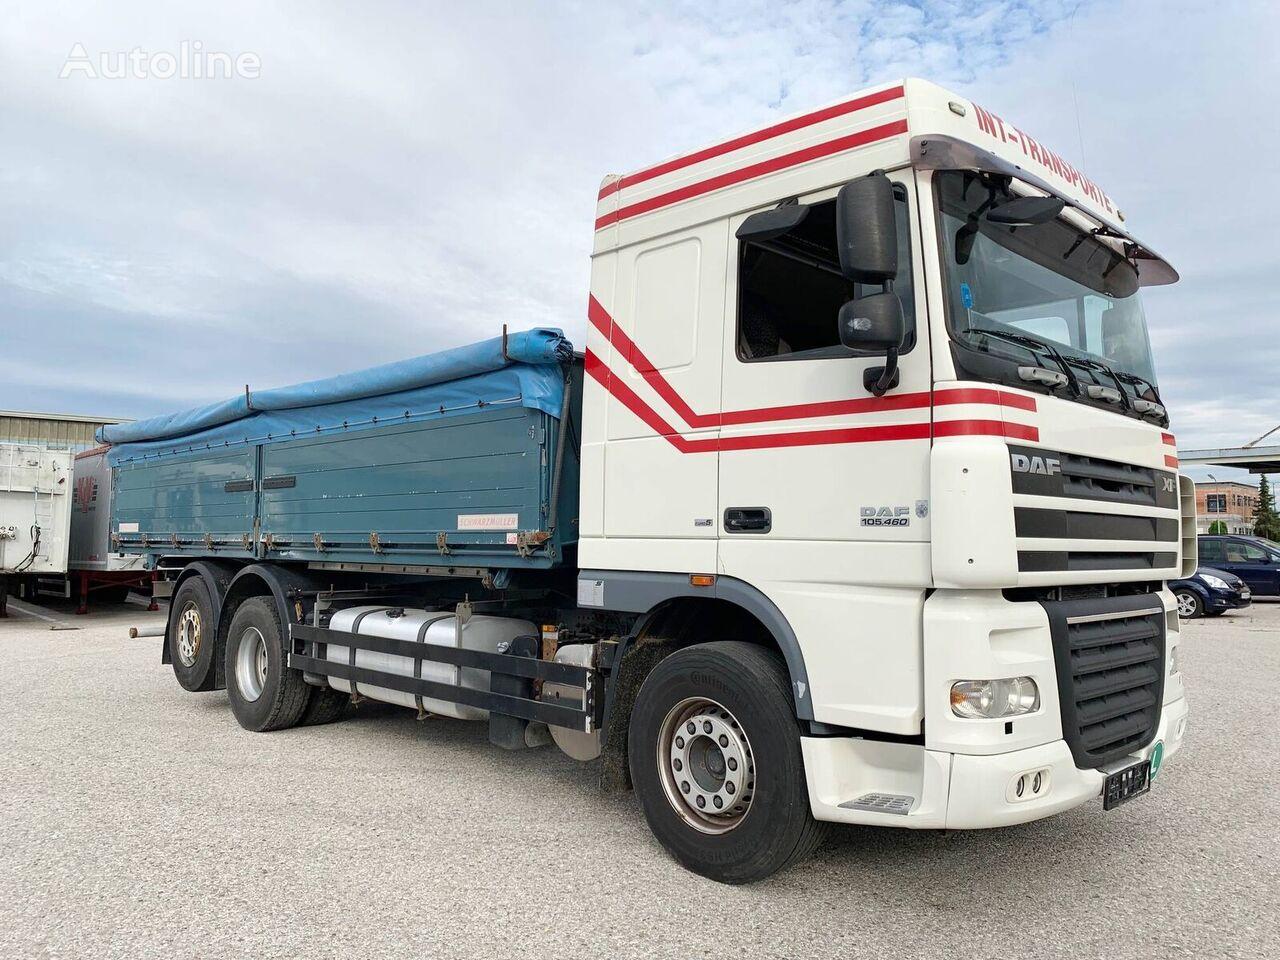 DAF XF105 grain truck